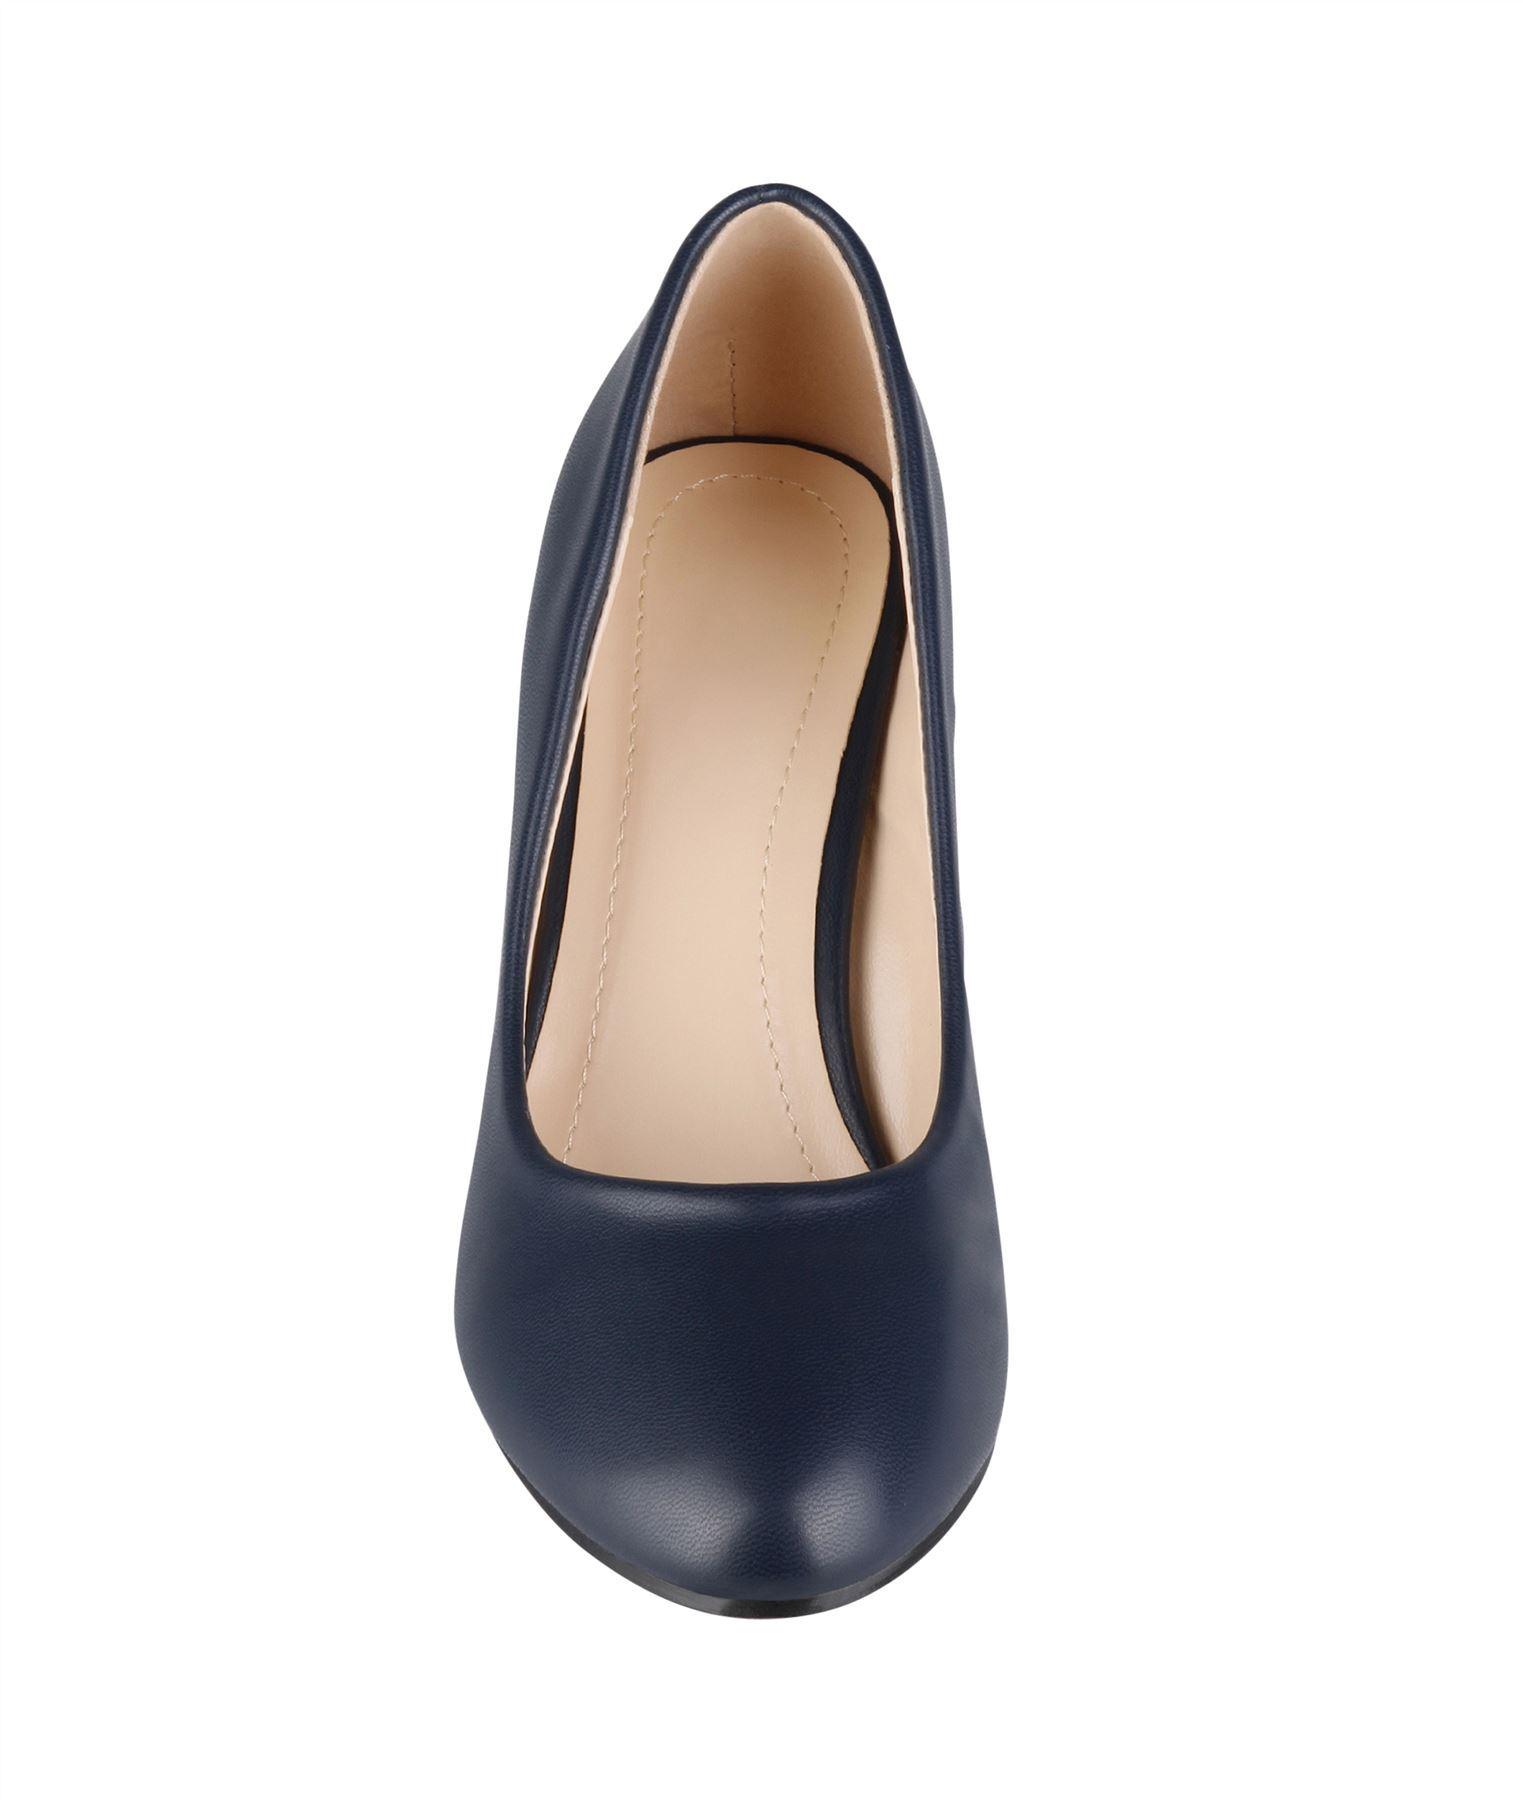 Womens-Ladies-Mid-Heel-Court-Shoes-Slip-On-Low-Kitten-Heels-Pumps-Matte-Size-3-8 thumbnail 14